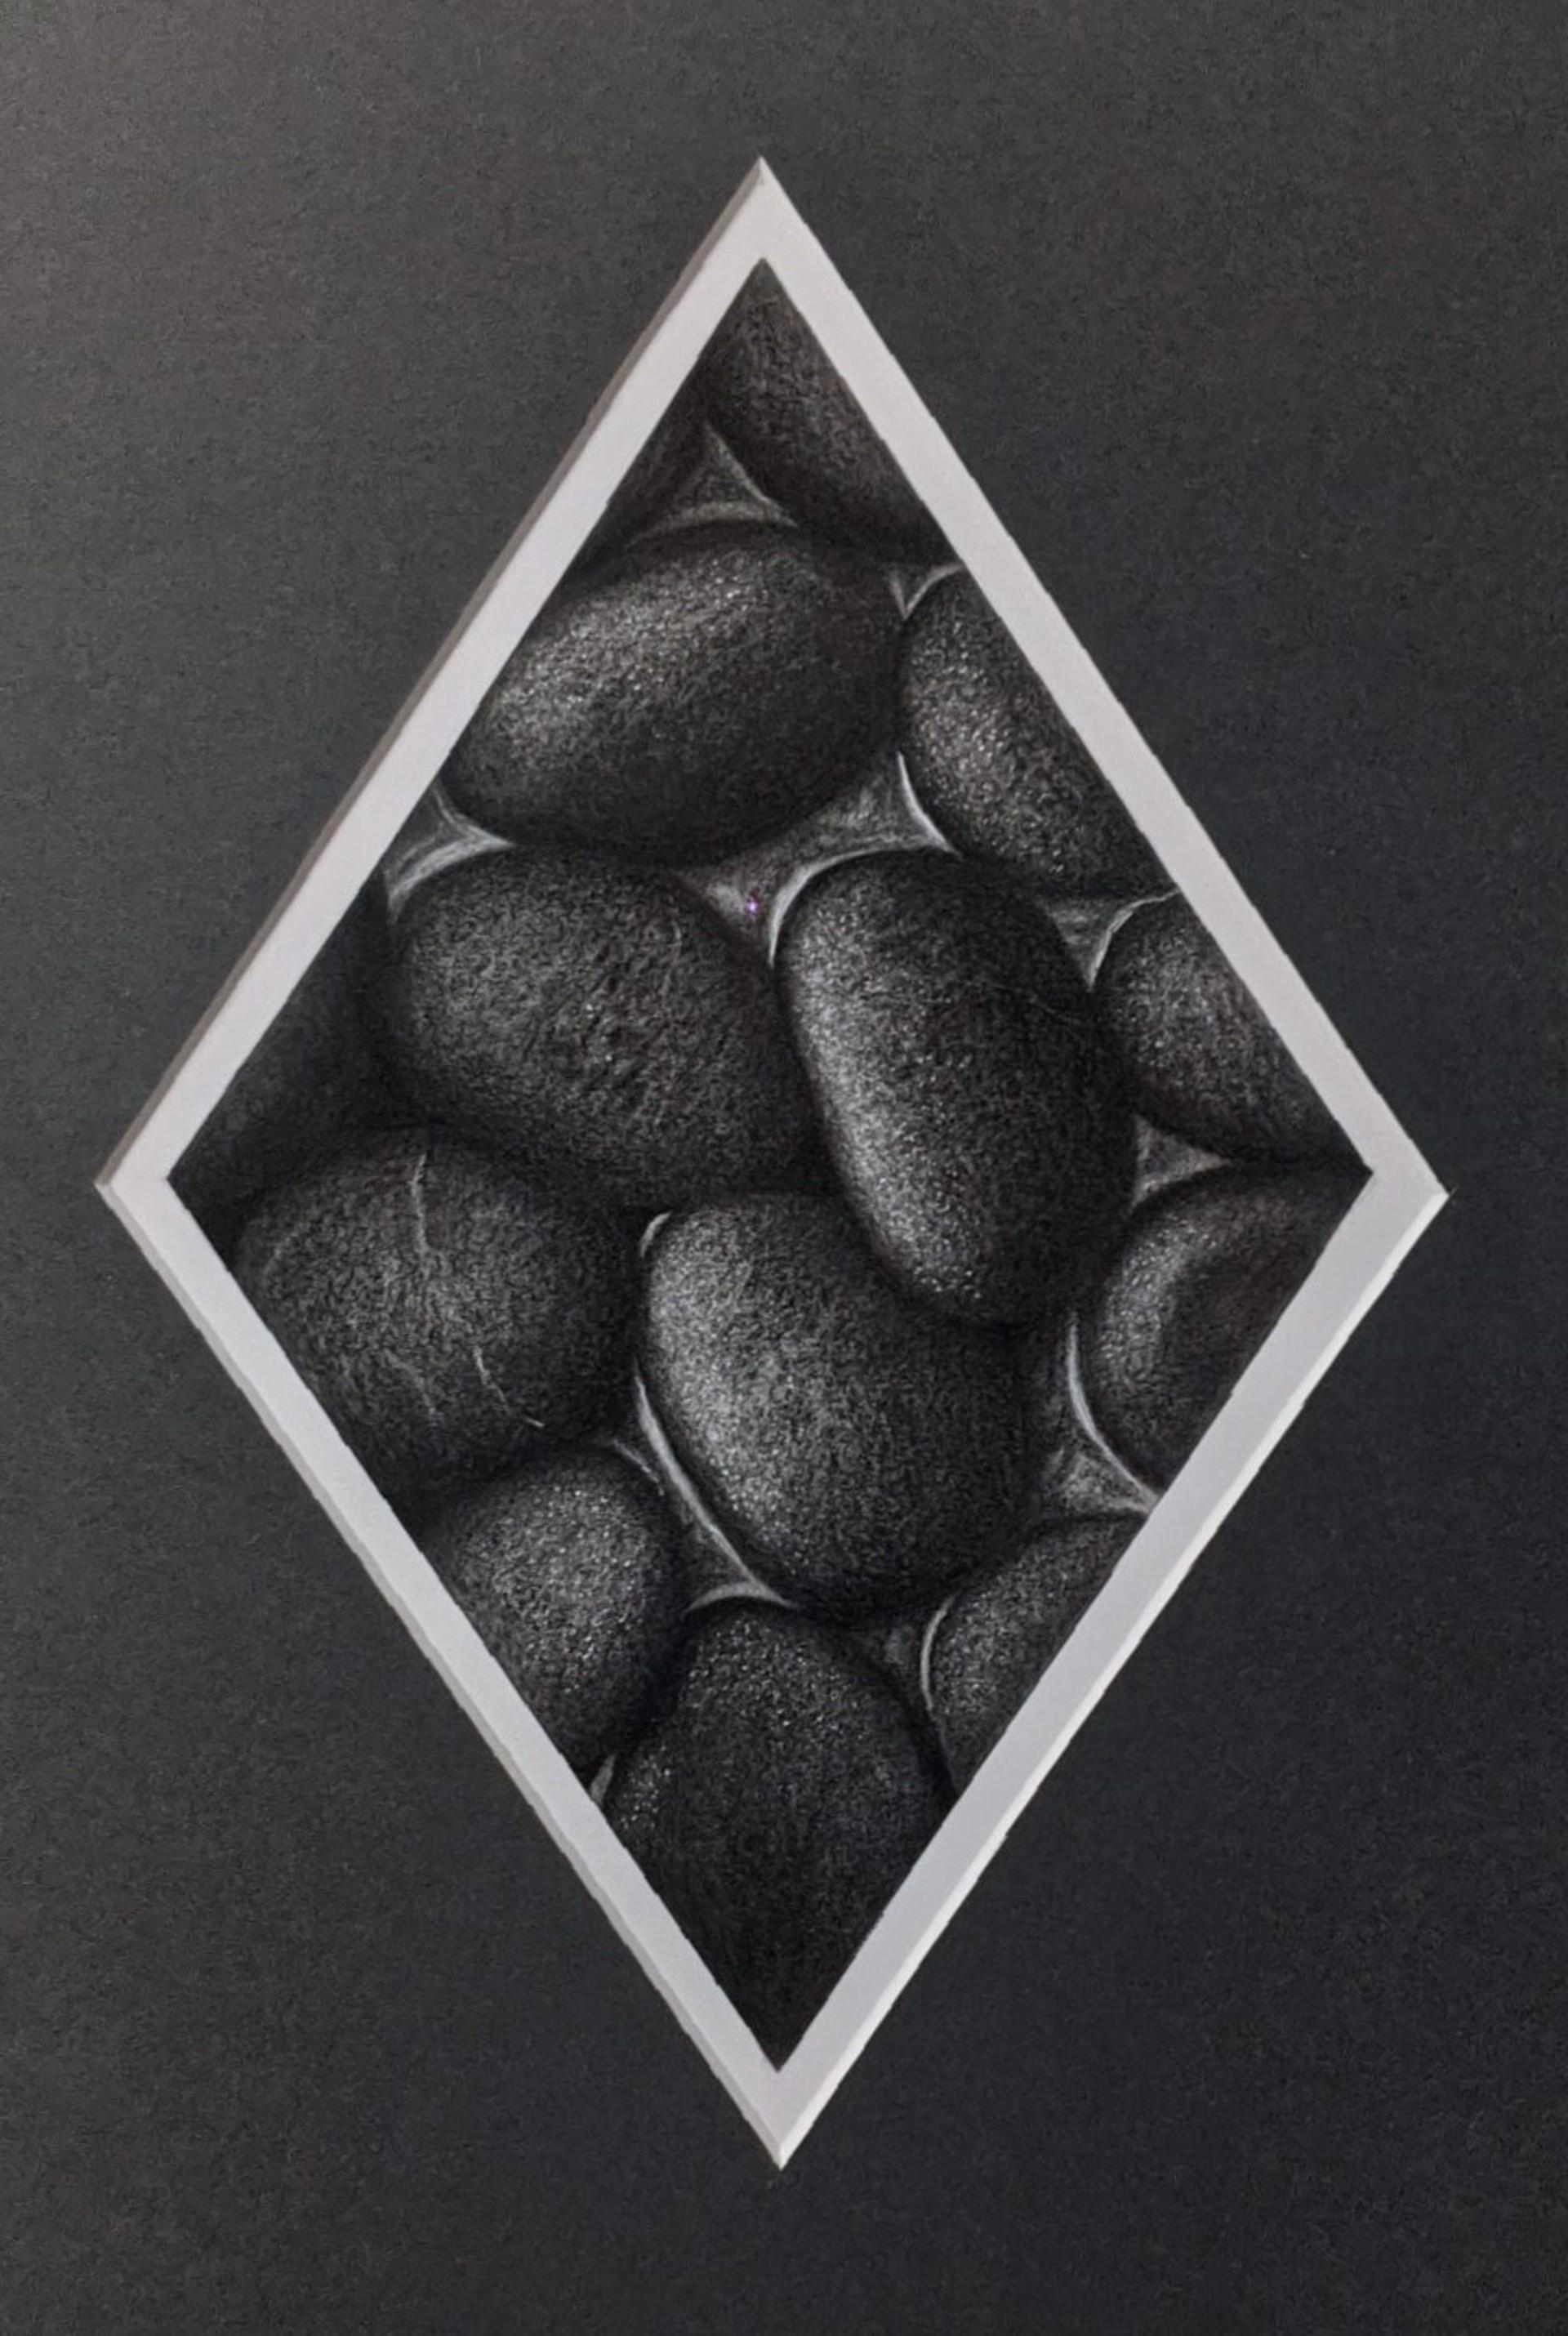 Diamond Life by Tammy Liu-Haller